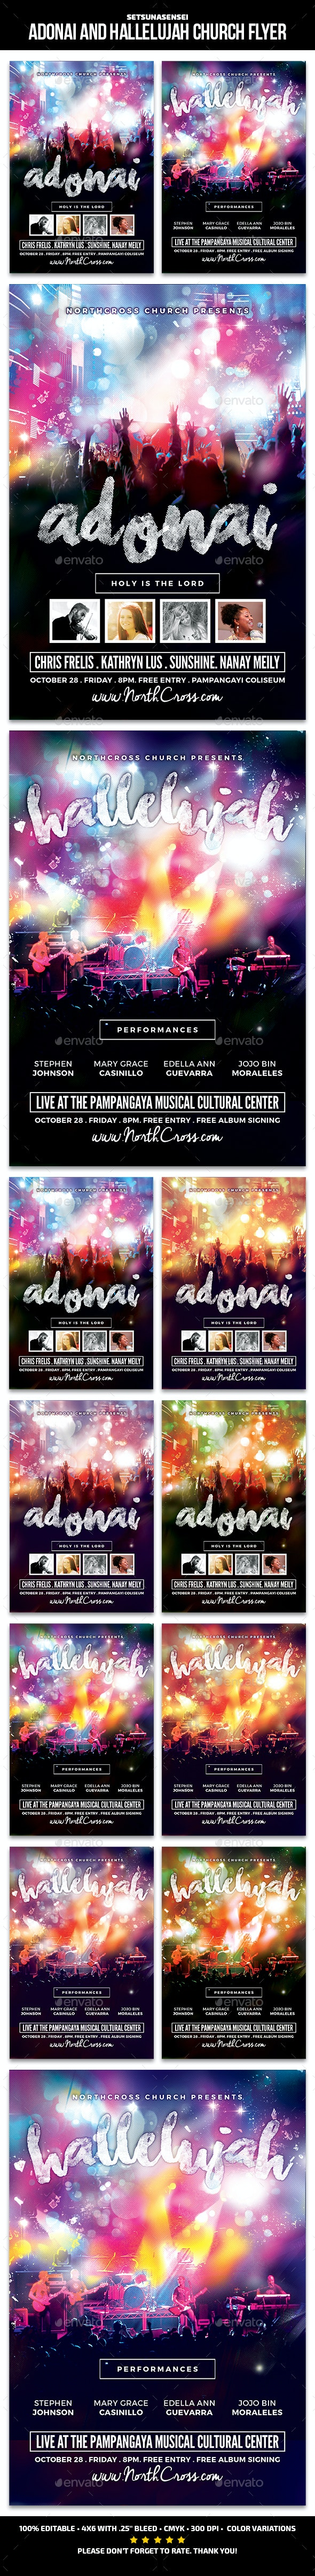 Adonai and Hallelujah Church Flyer - Church Flyers